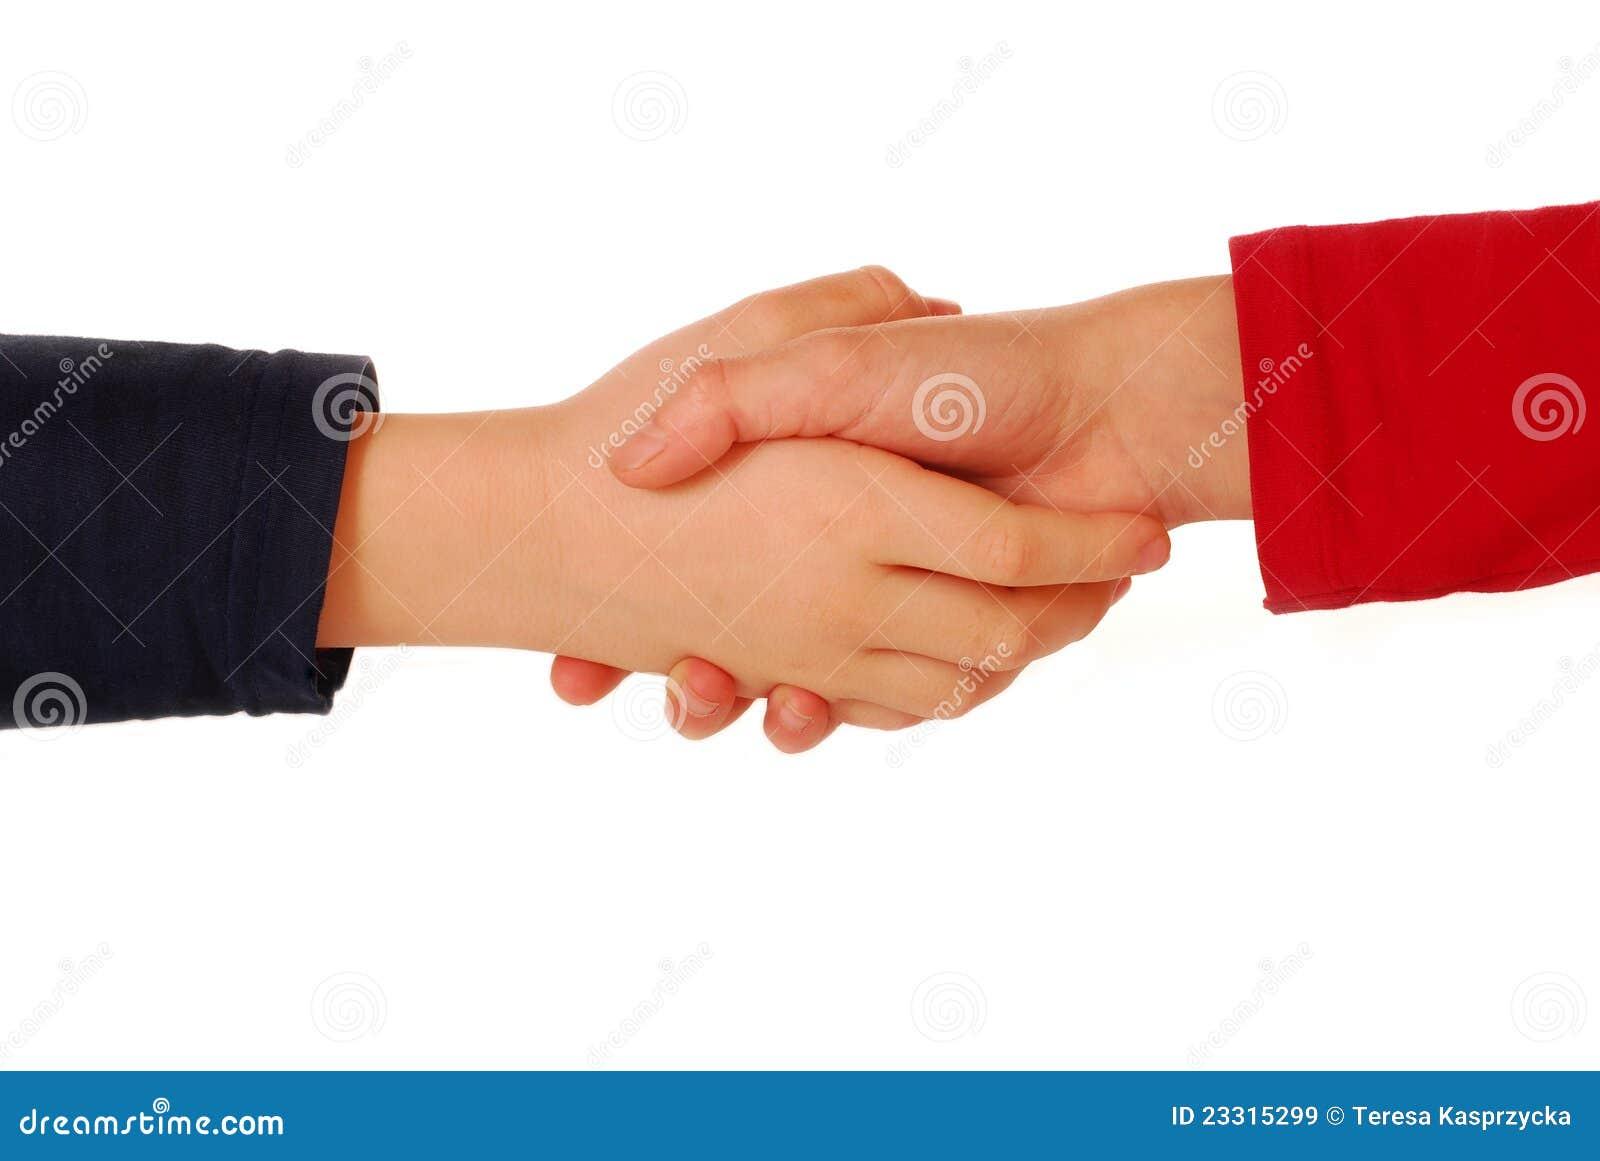 children handshake clipart - photo #27